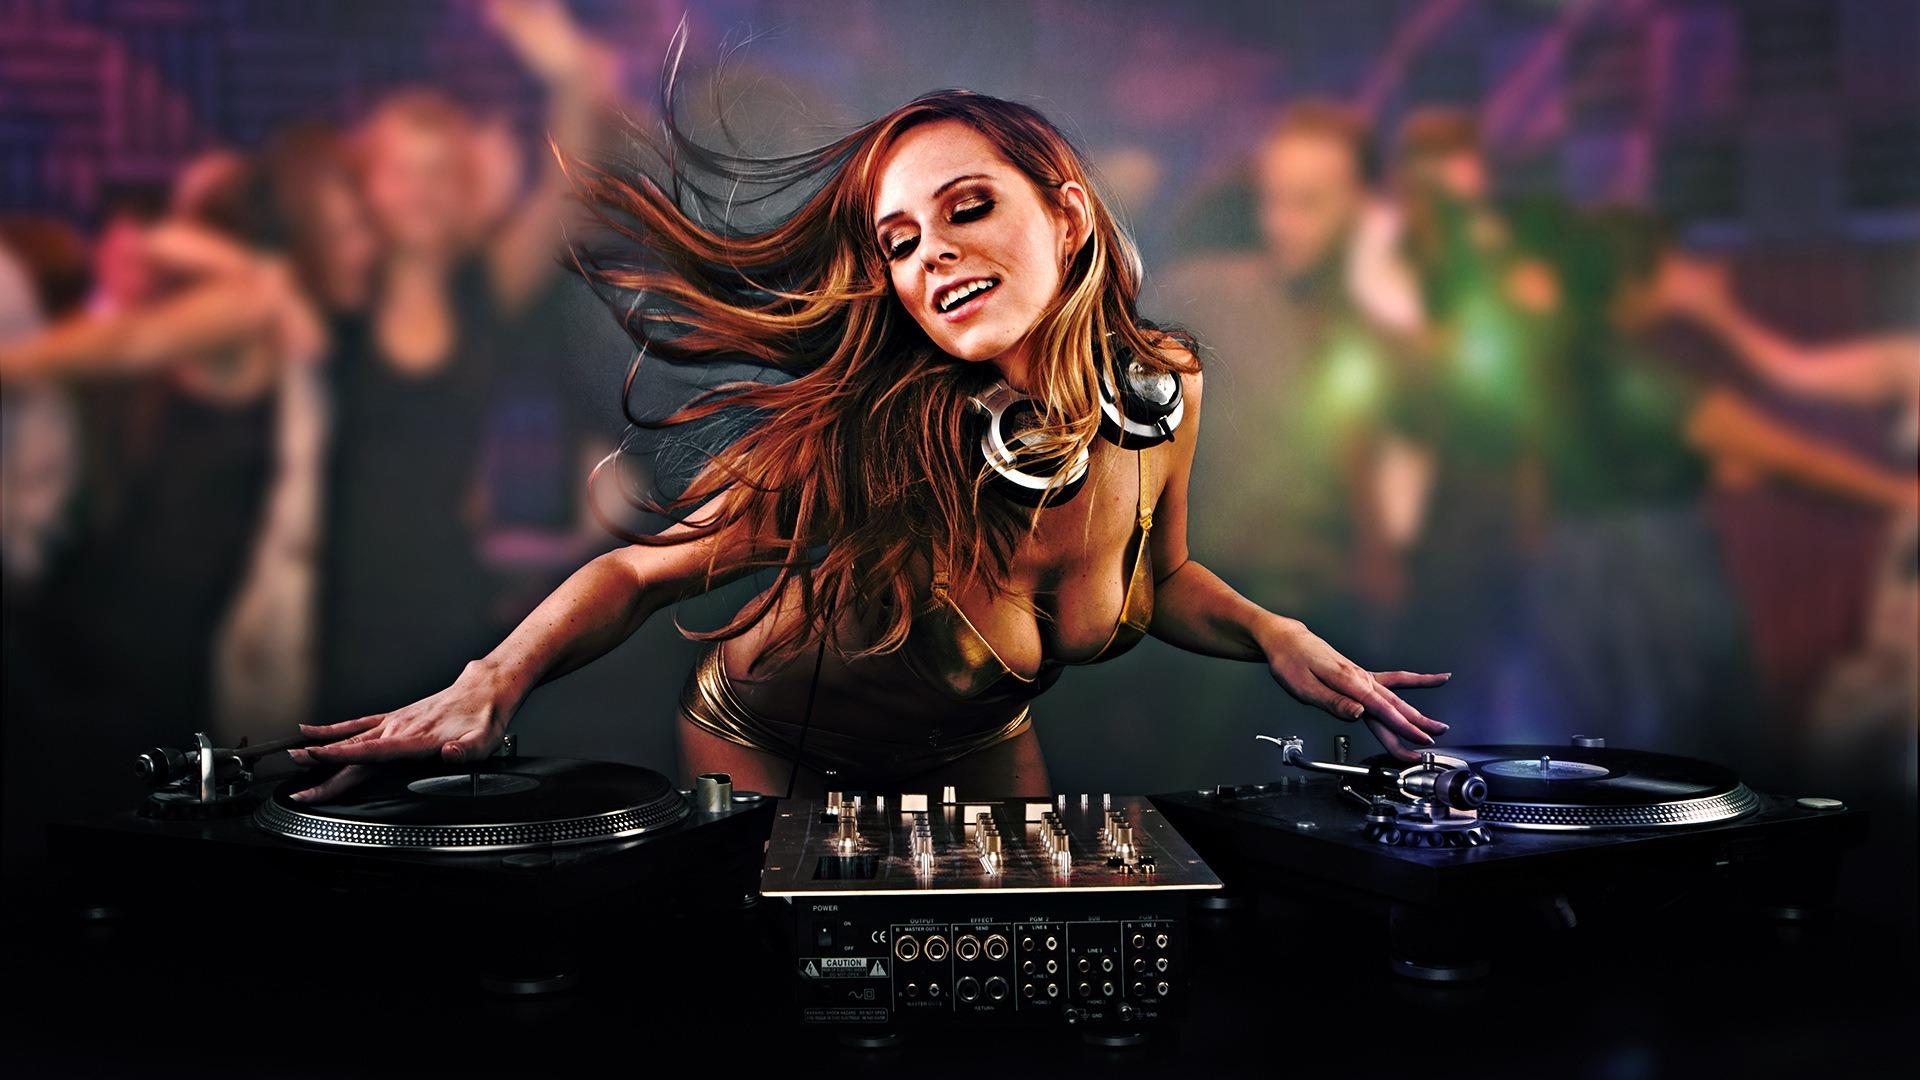 ok google найти музыку в mp3 формате dj electro house